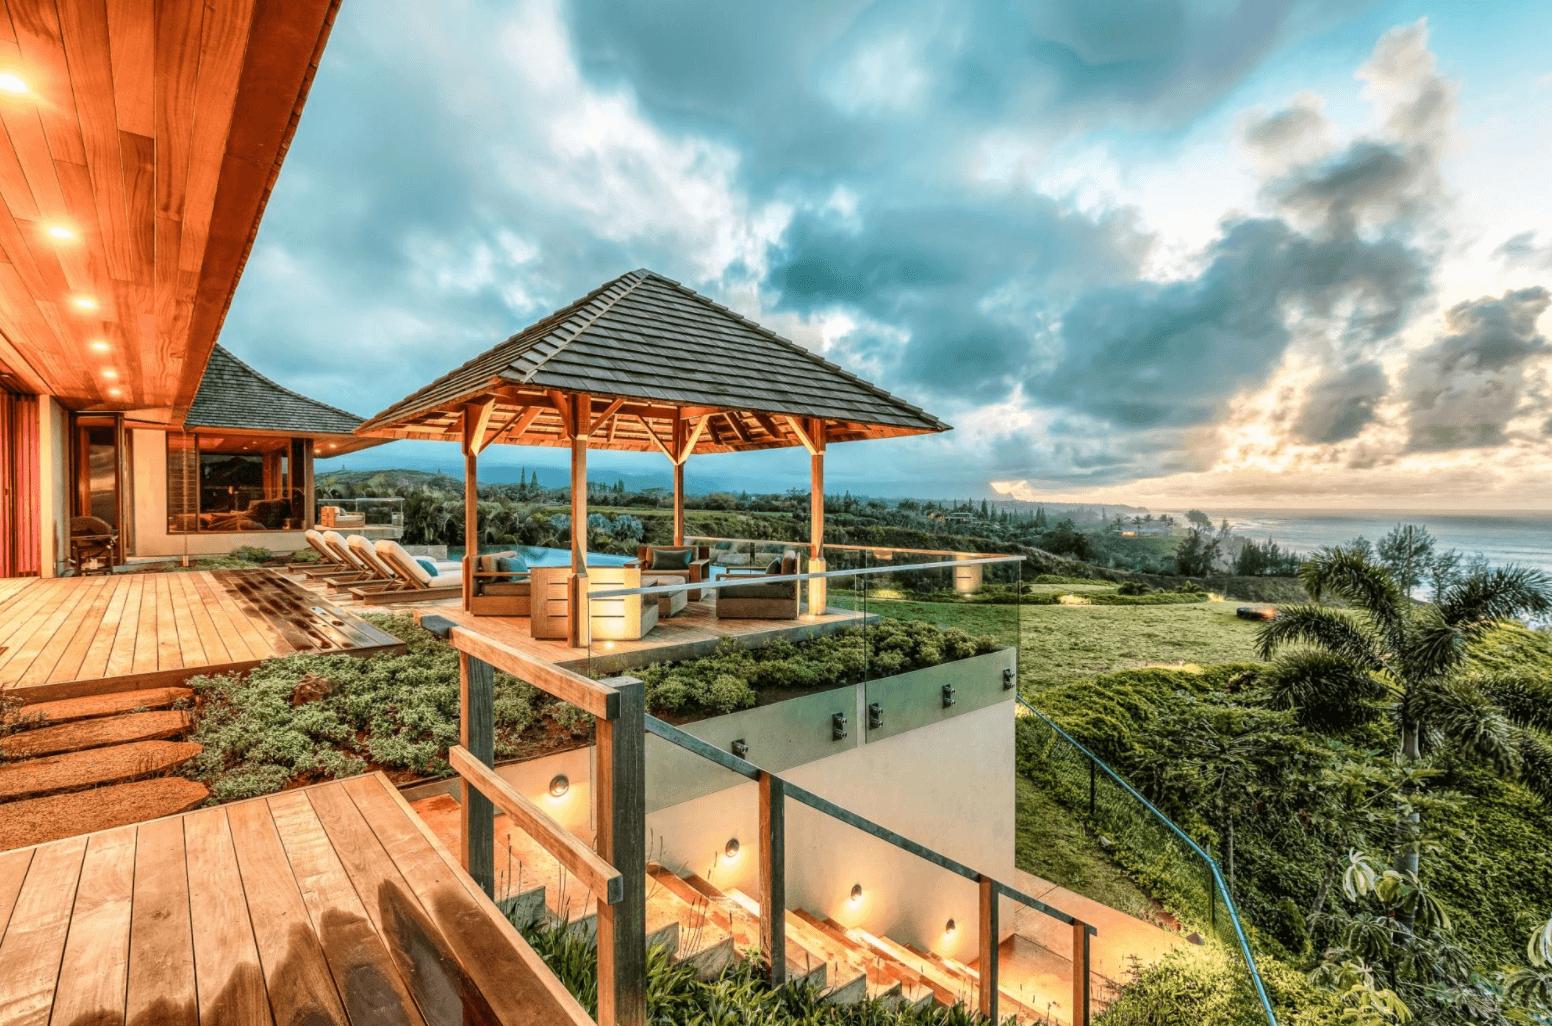 The Best Airbnbs in Kauai